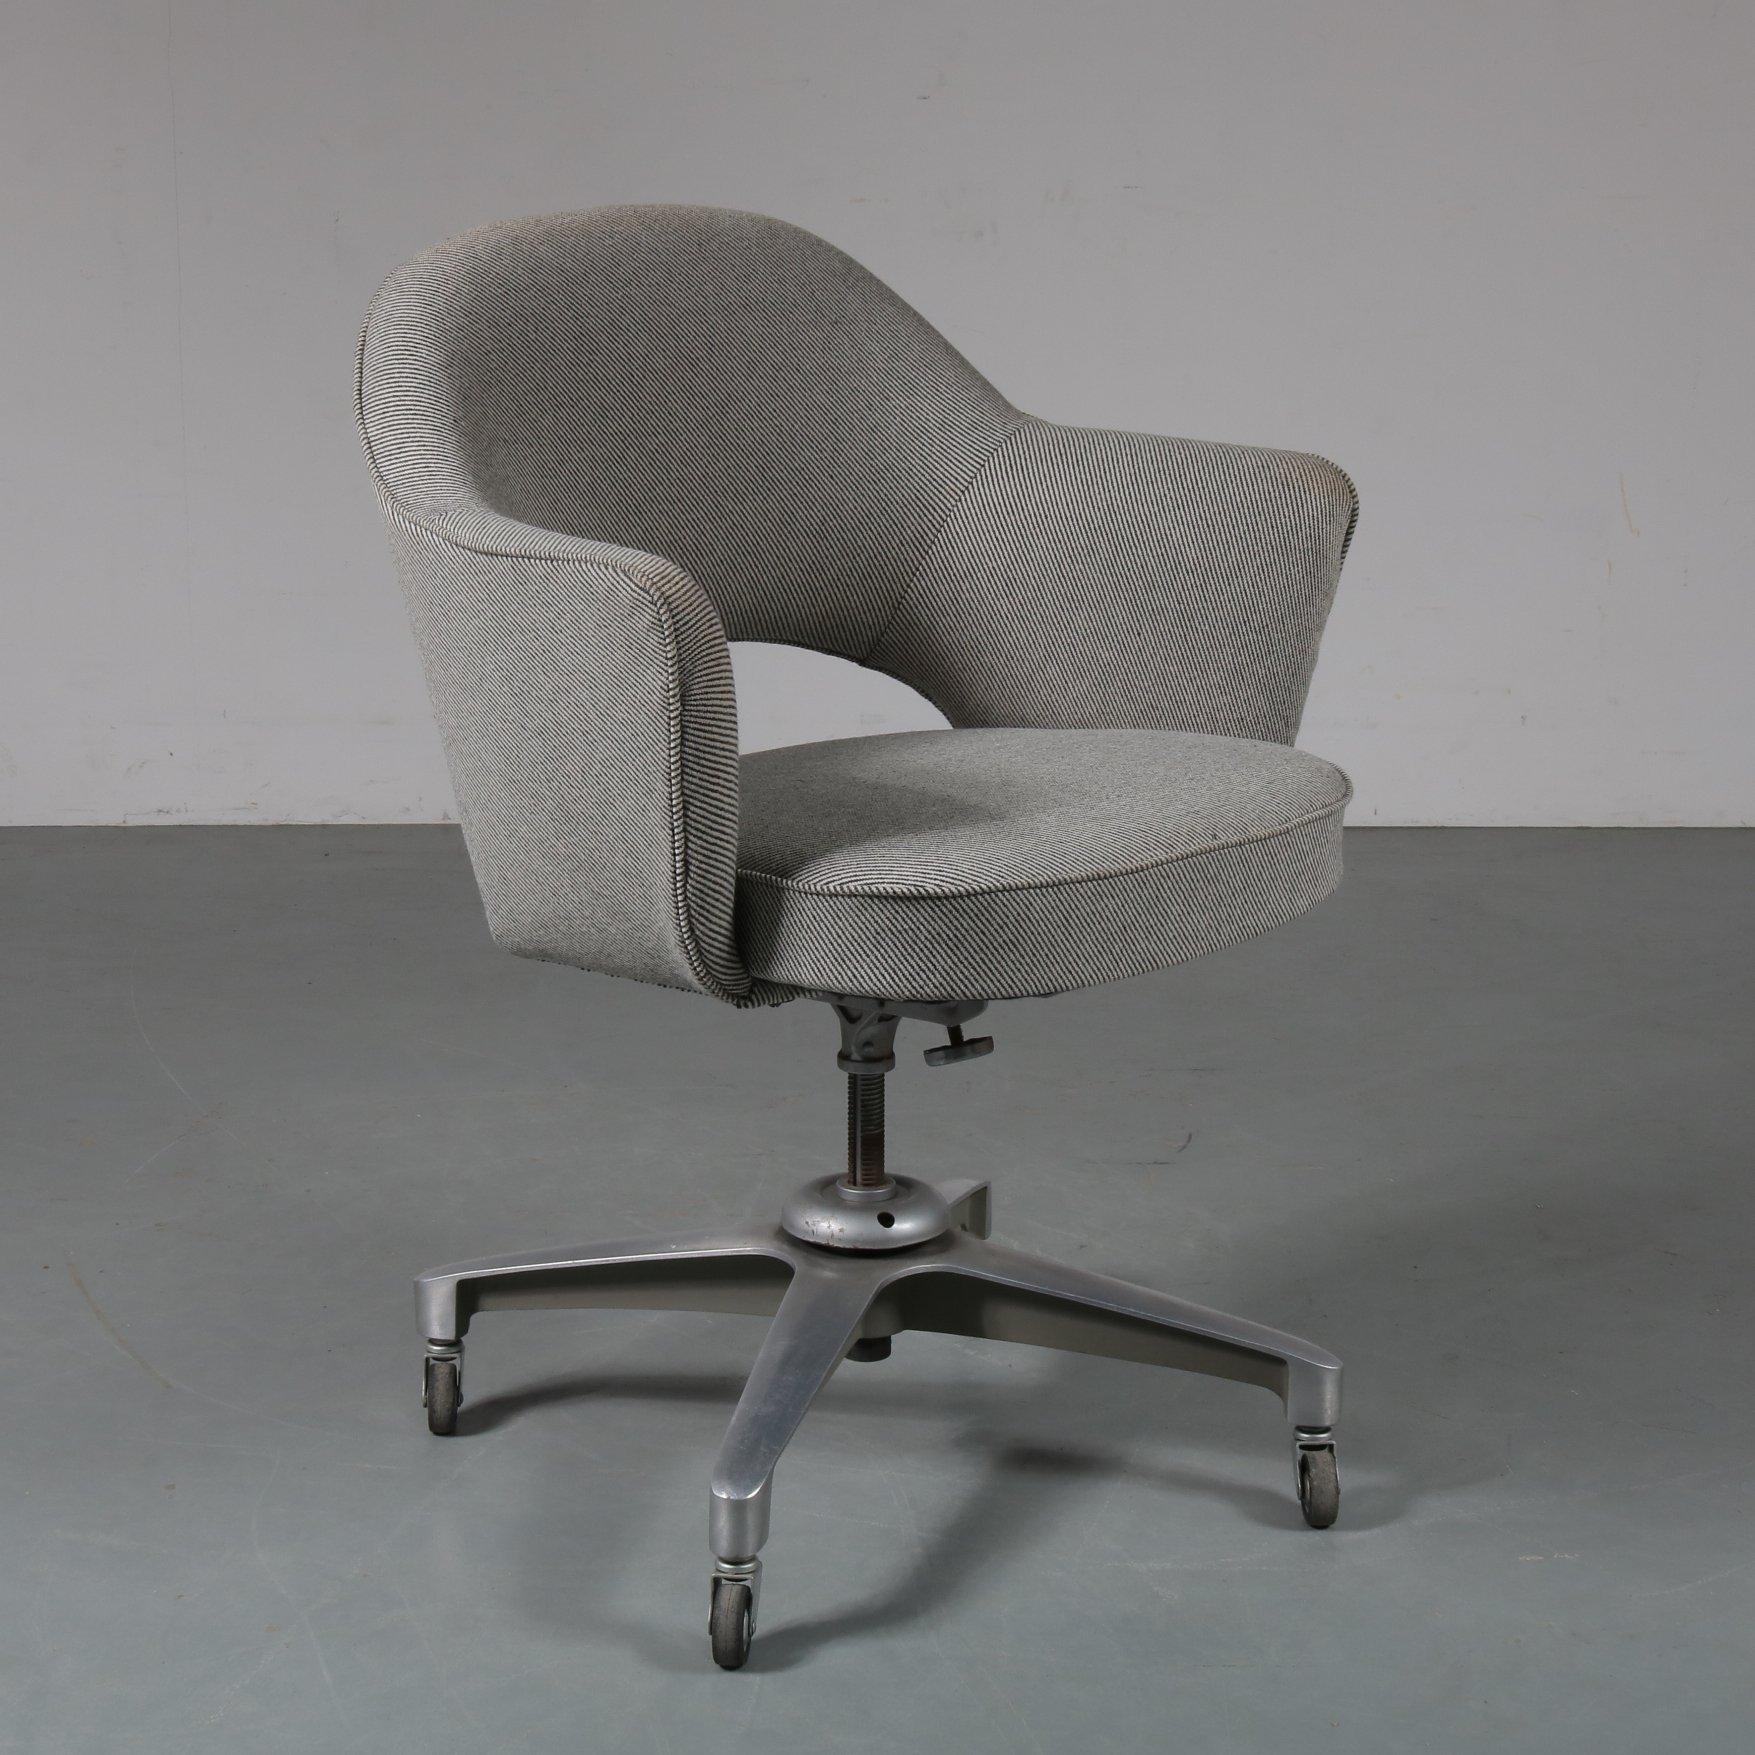 Desk Chair By Eero Saarinen For Knoll International 1960s 97419